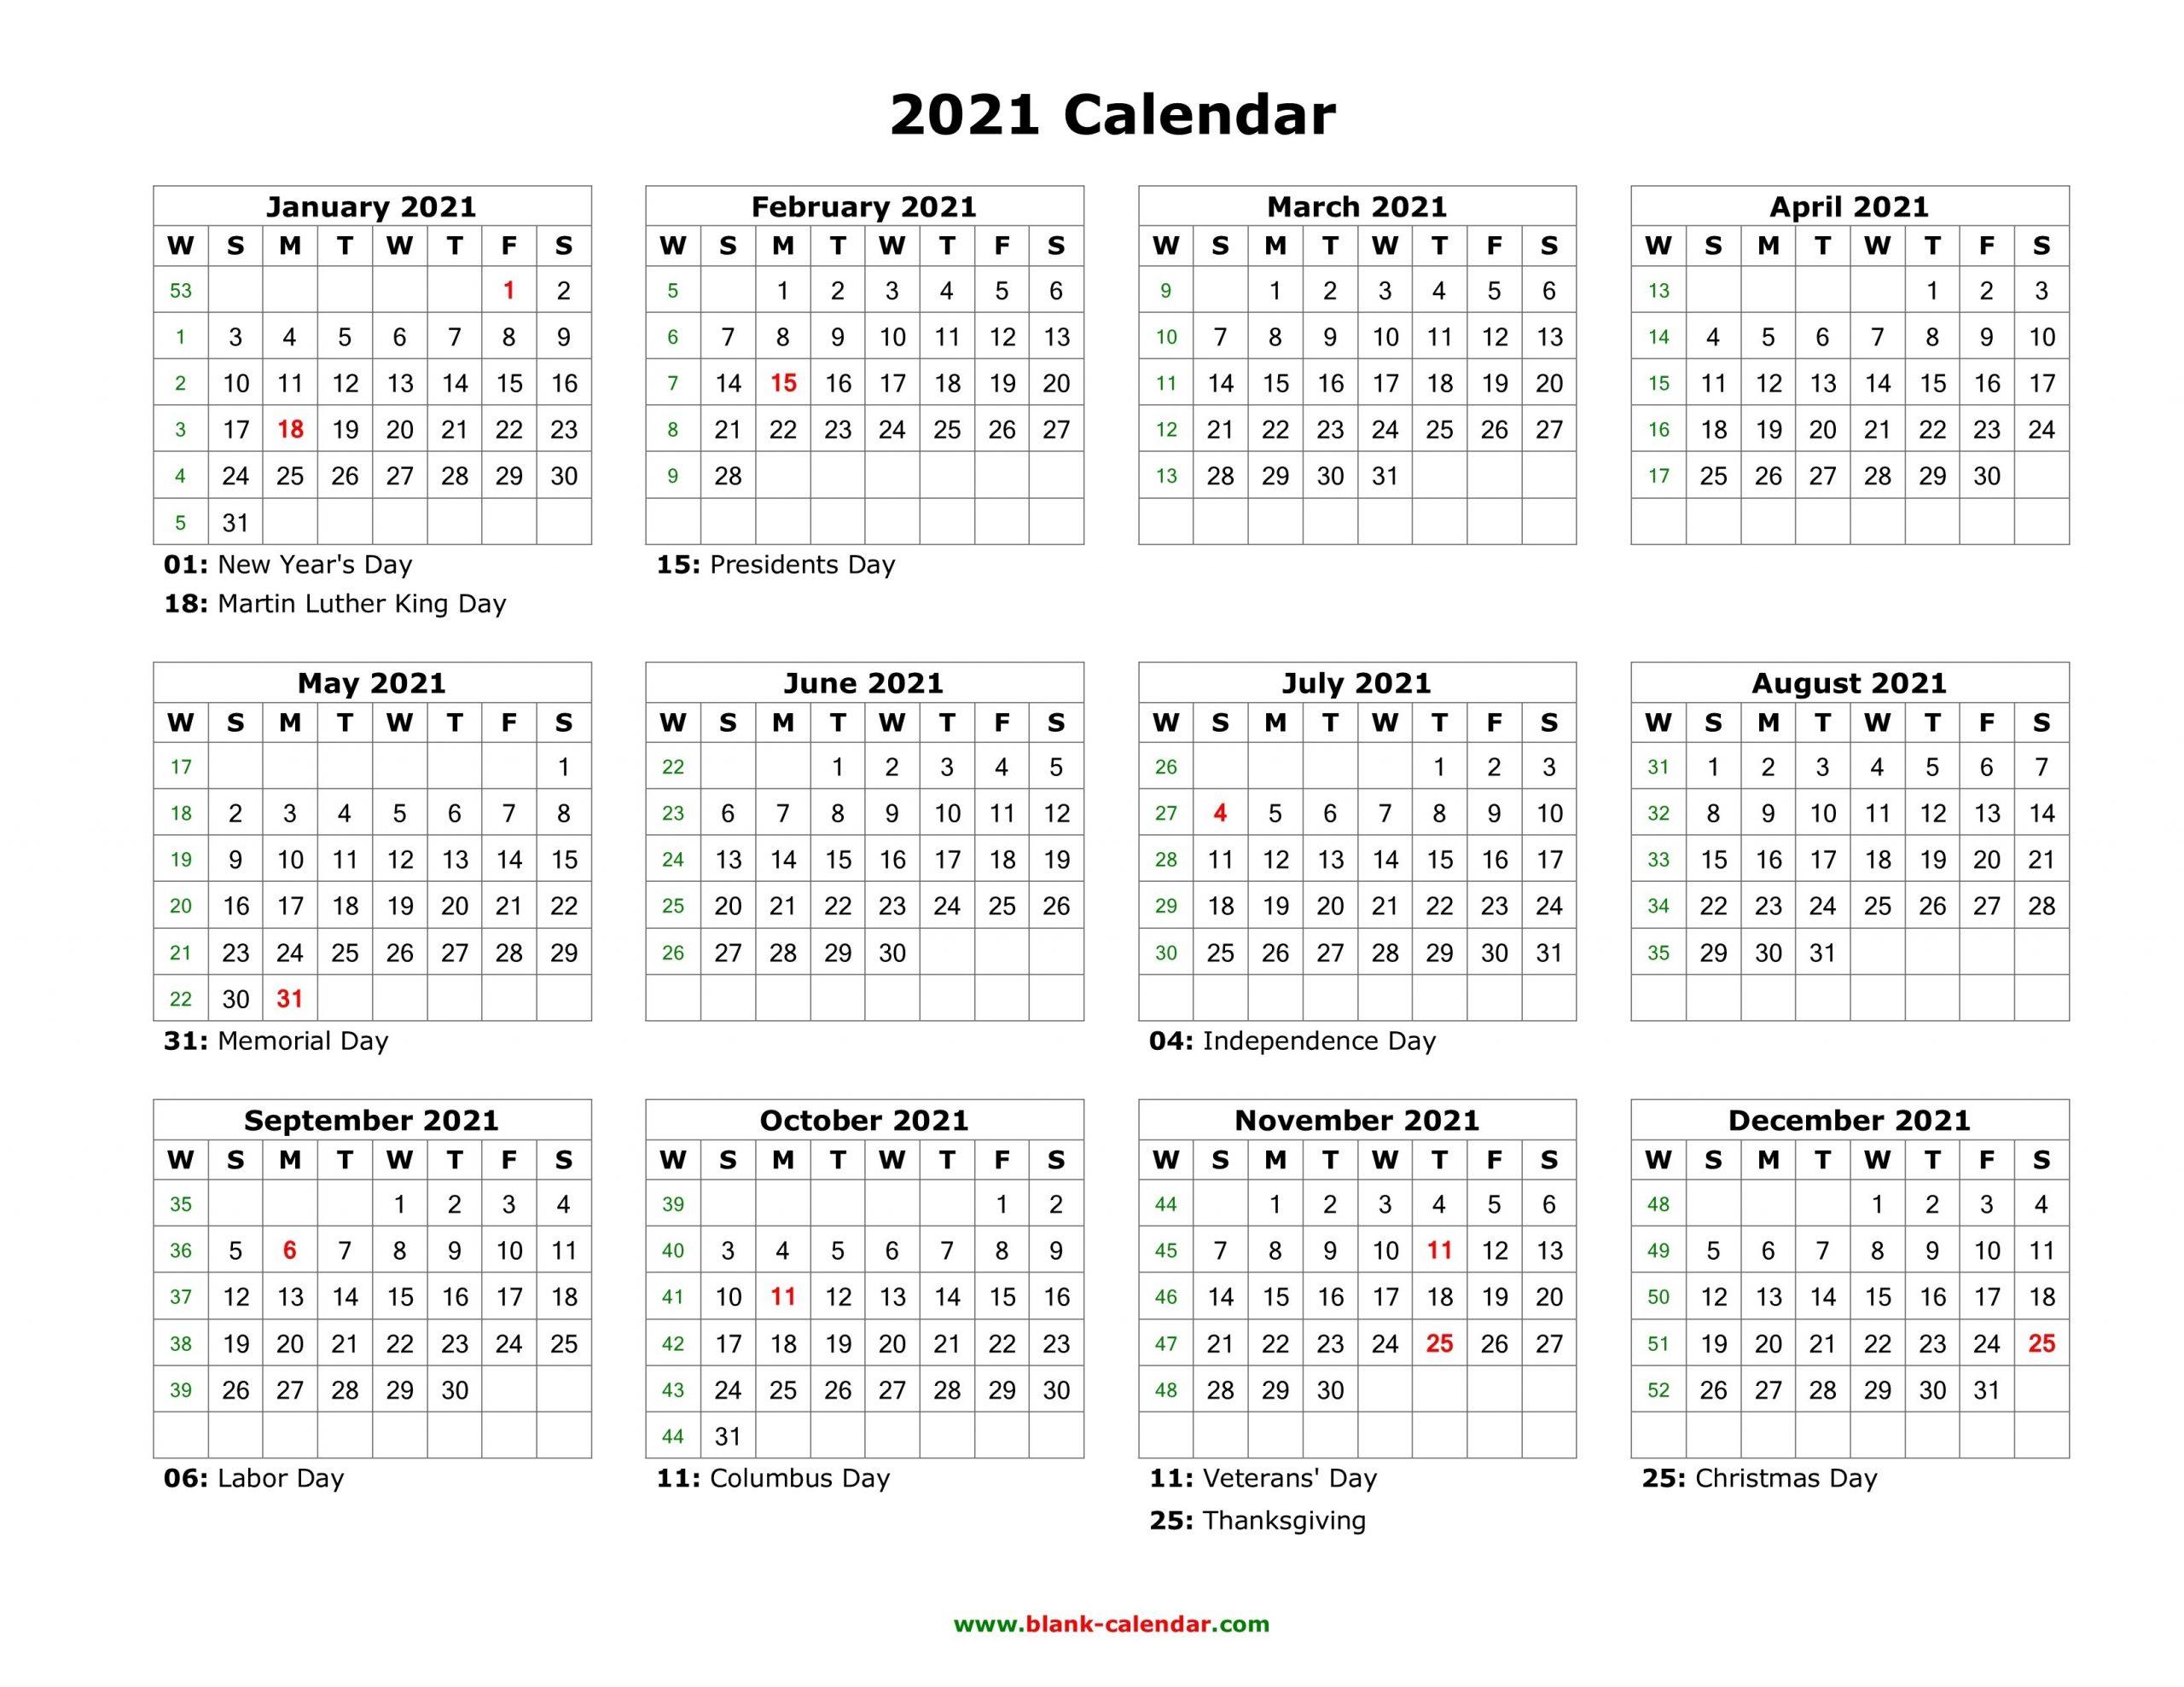 Free Printable Calendar Year 2021 | Calendar Printables Free Templates pertaining to One Page 2021 Calendar Printable Images